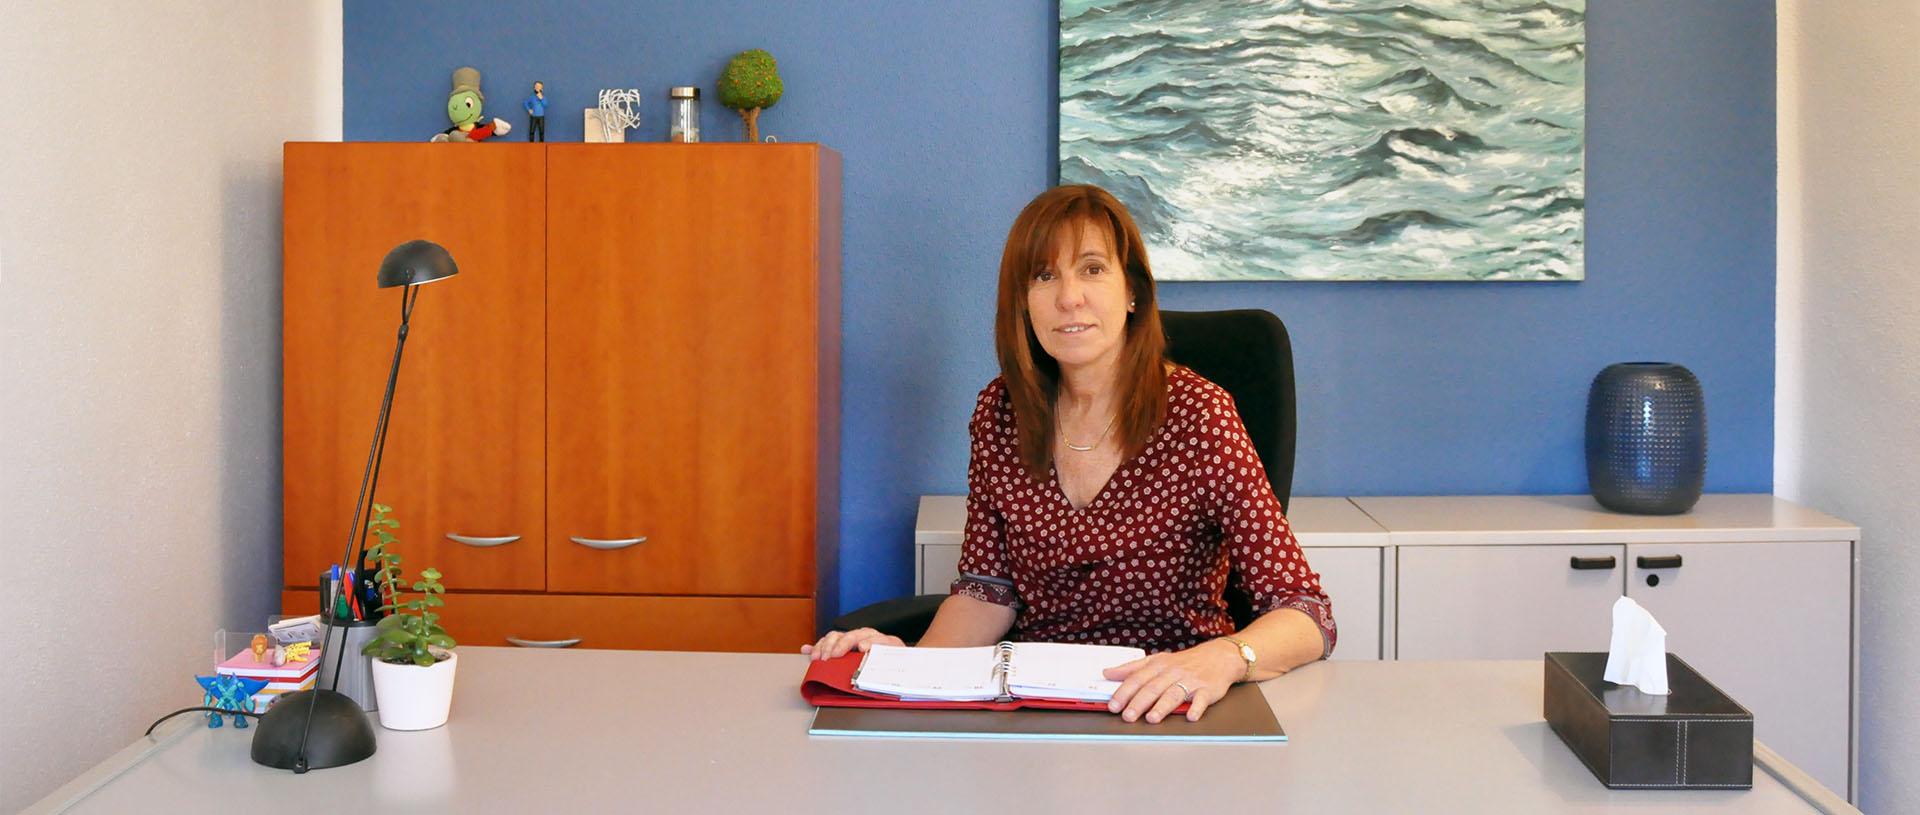 GNÒSIC - MTeresa Figueras Sardó - Centre de Psicologia a Palamós